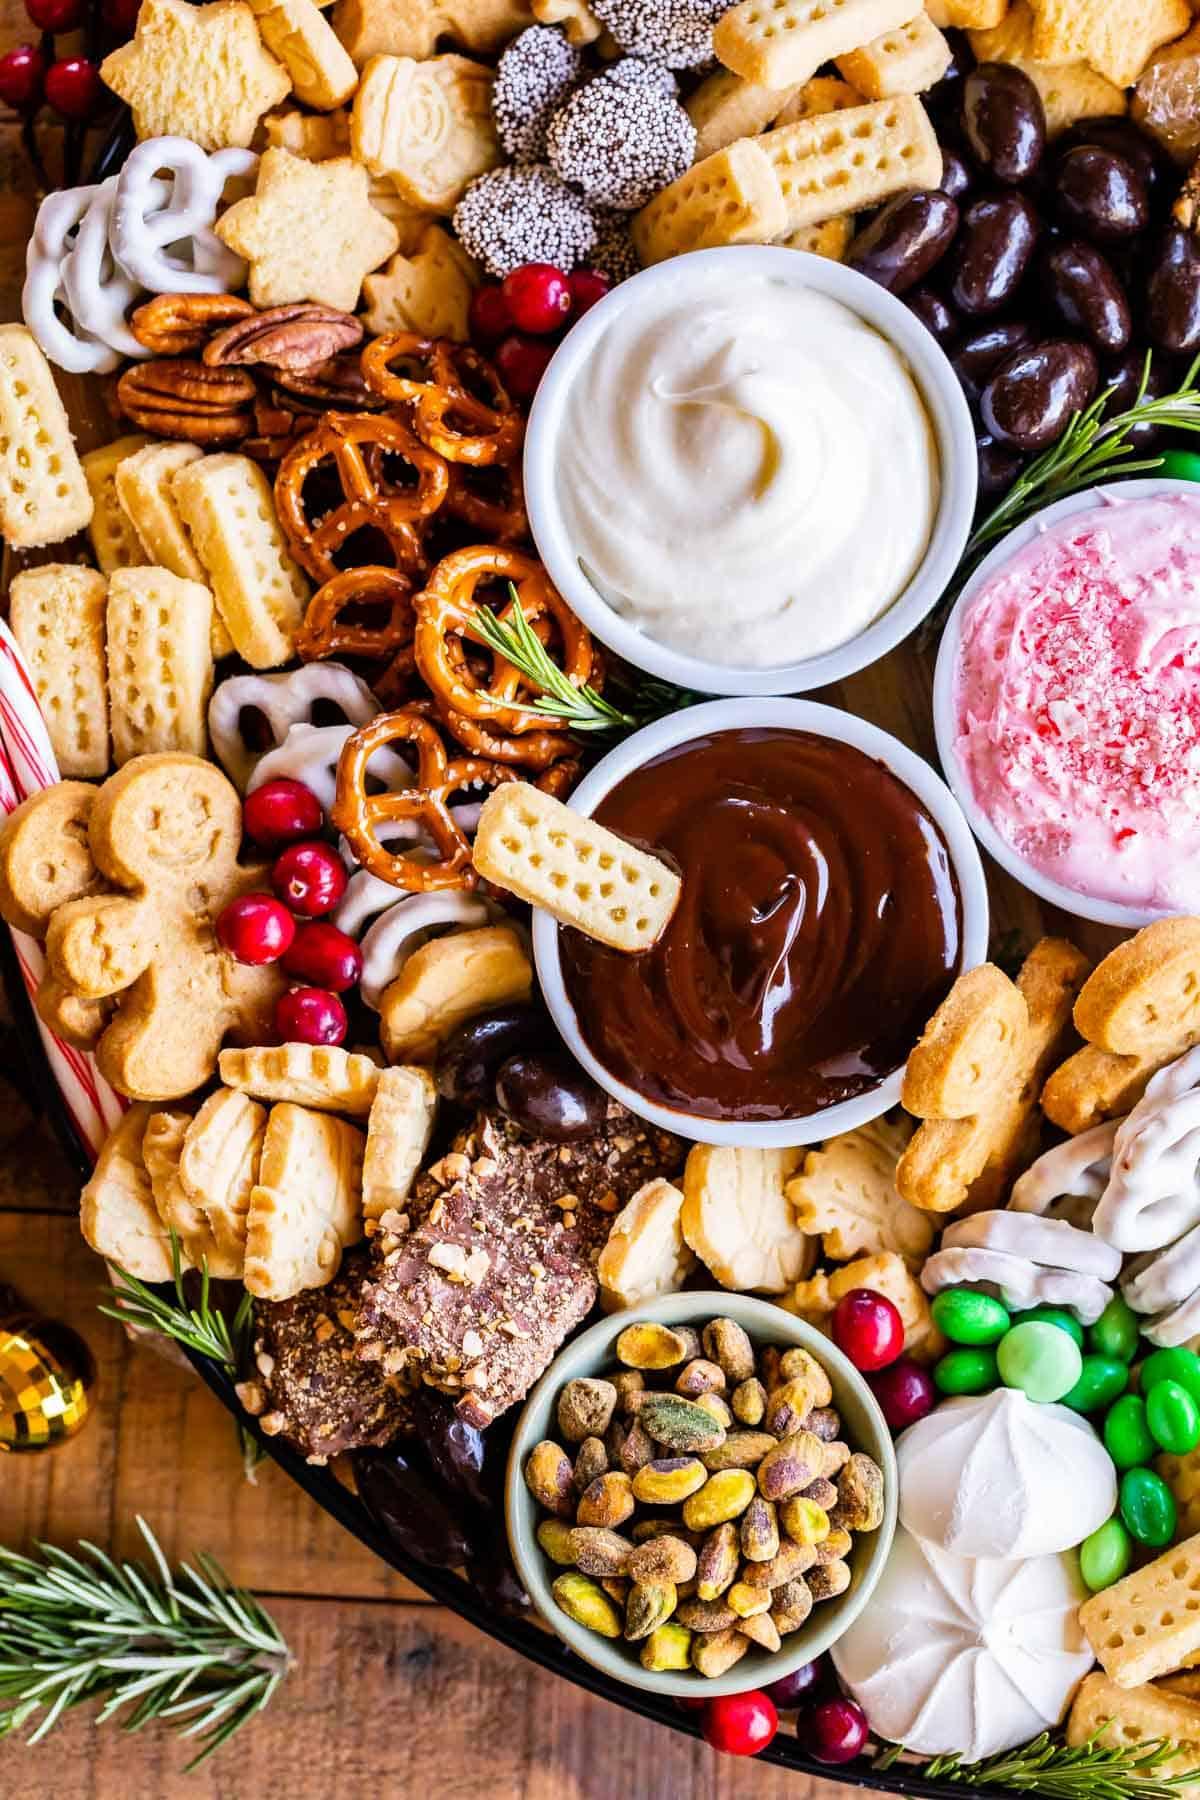 Dessert Charcuterie Board with Walkers Shortbread Cookies